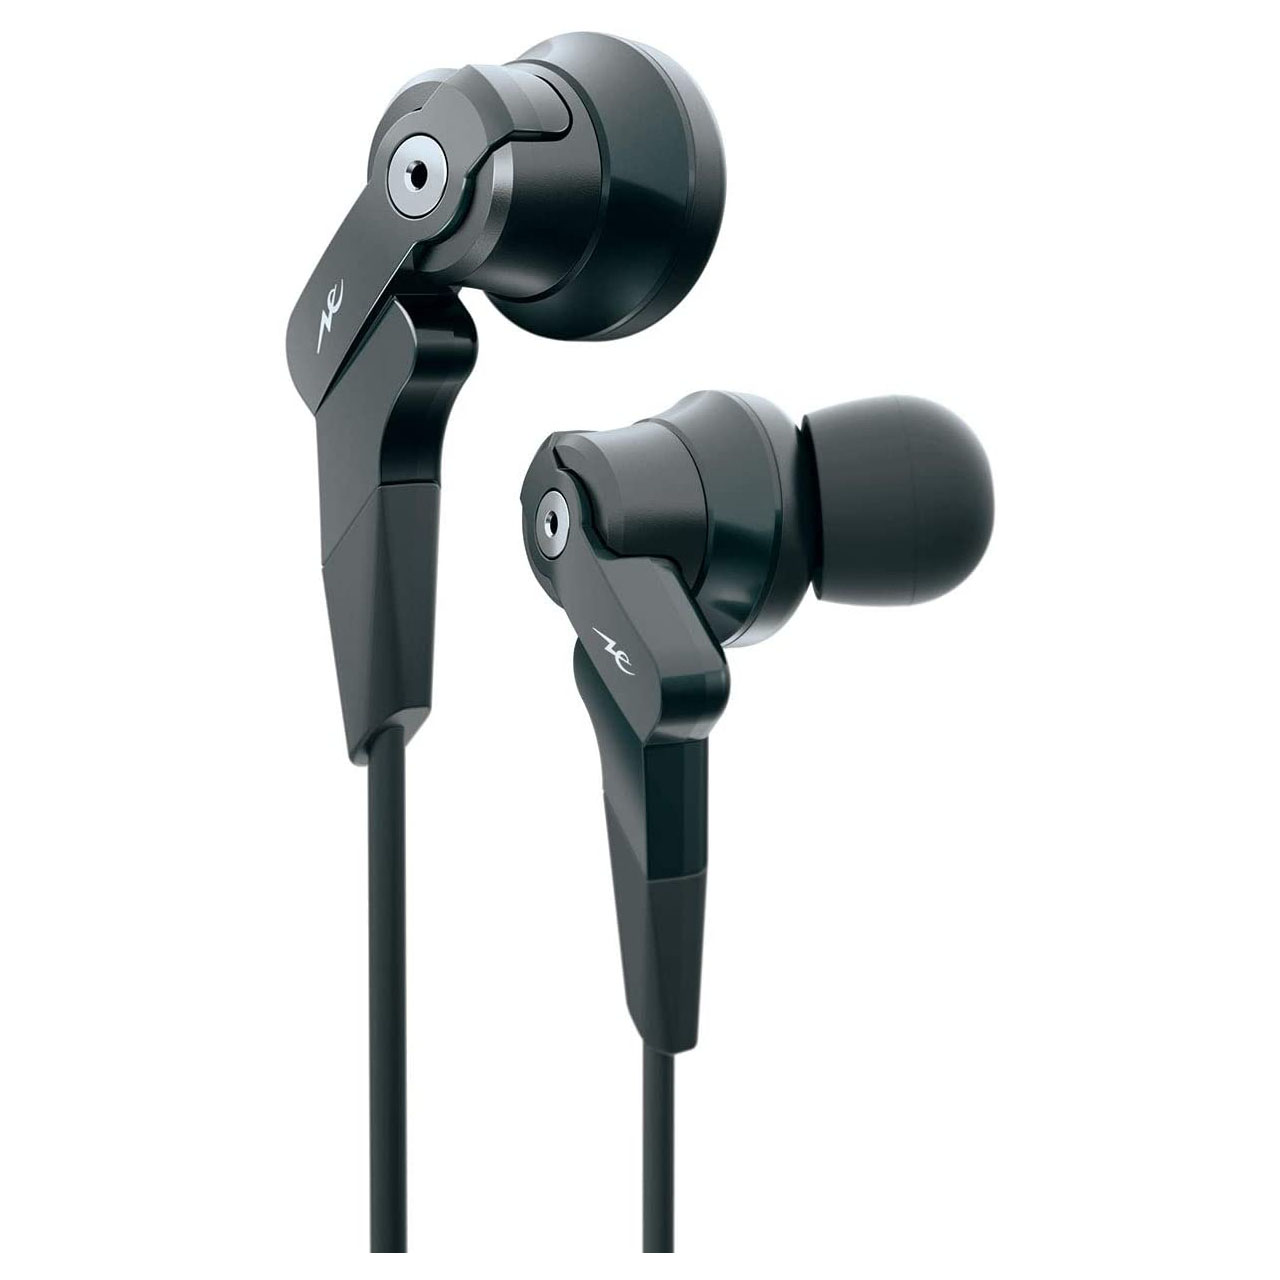 HP-V100BT 重低音Bluetoothイヤホン VOLT Series